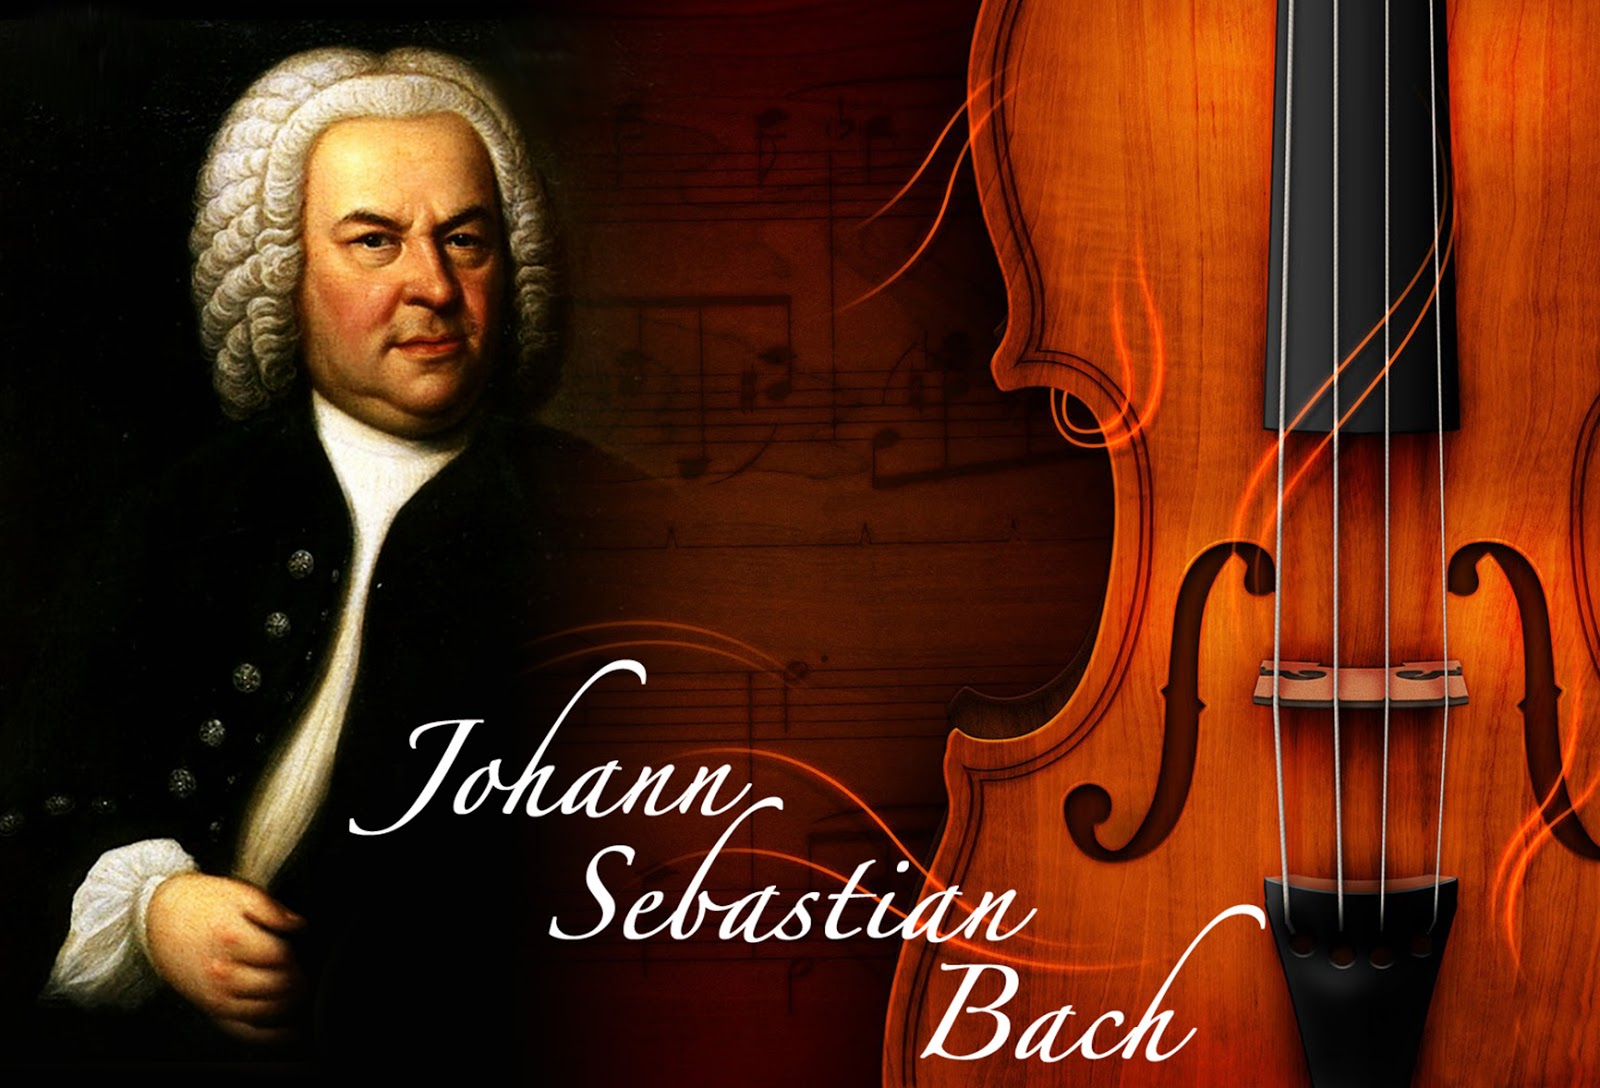 the life and times of johann sebastian bach Product description: johann sebastian bach (1685-1750) was the father of modern music, a supreme craftsman able to.